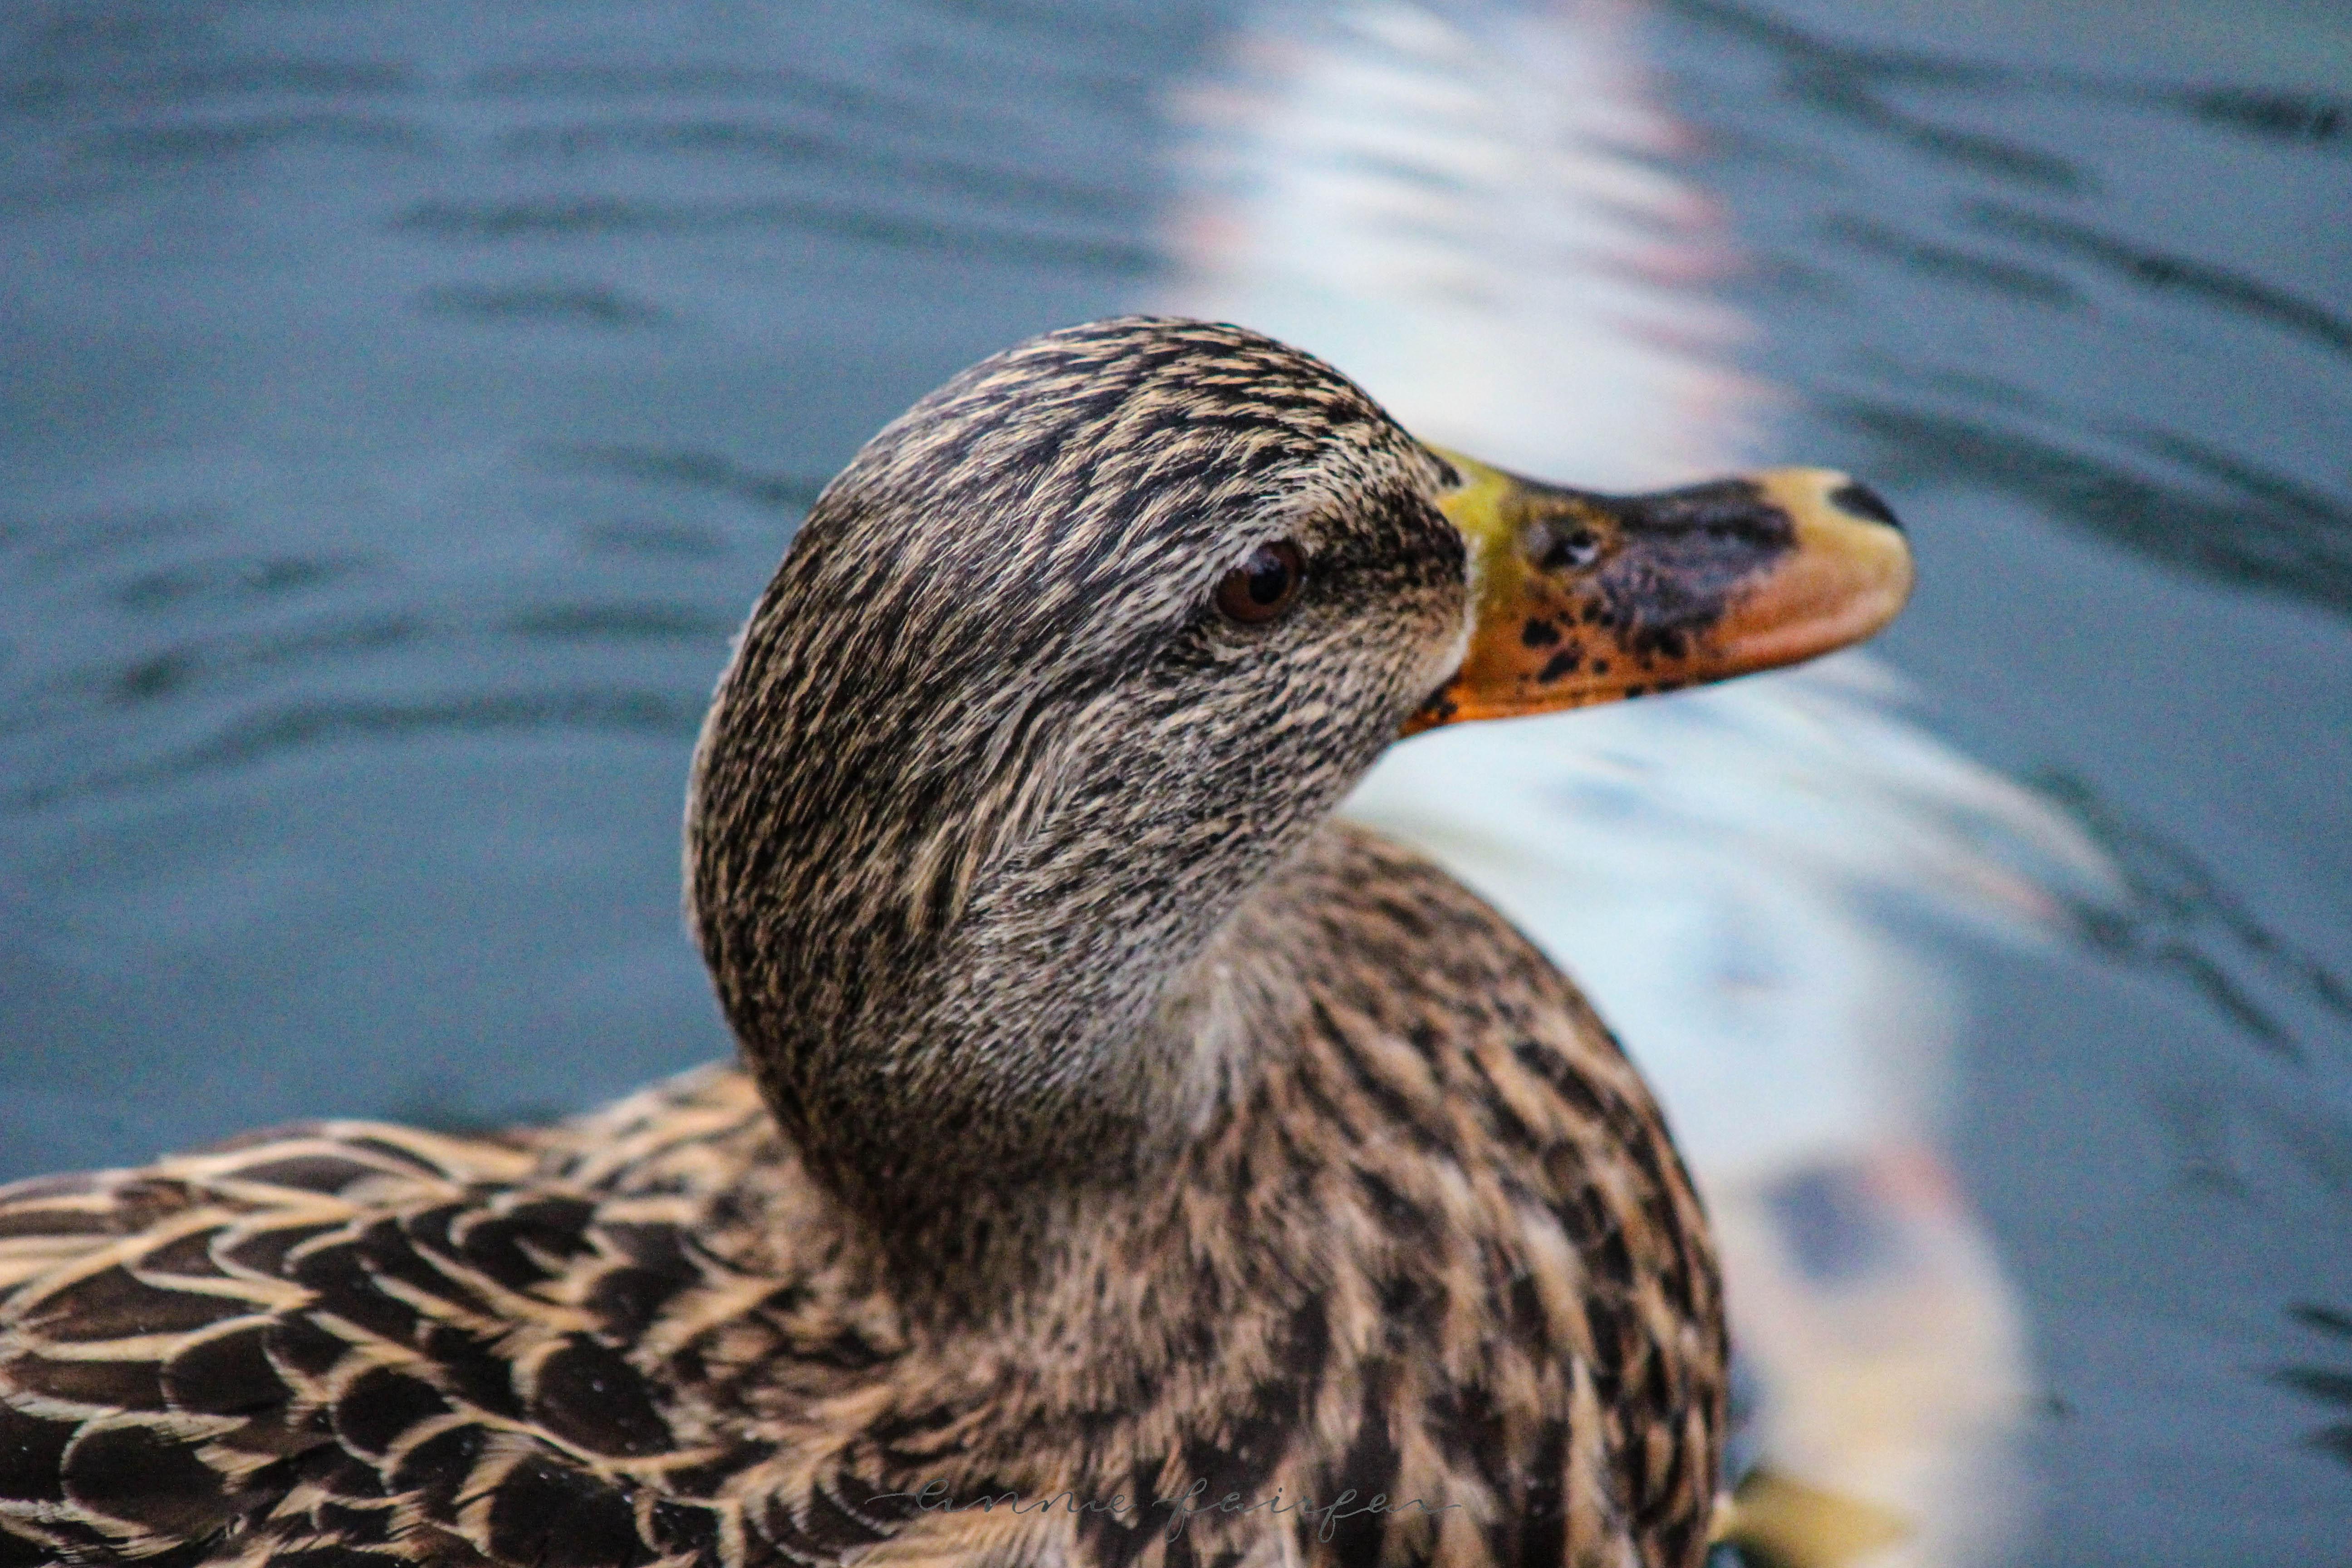 Ducks Photographed by Annie Fairfax